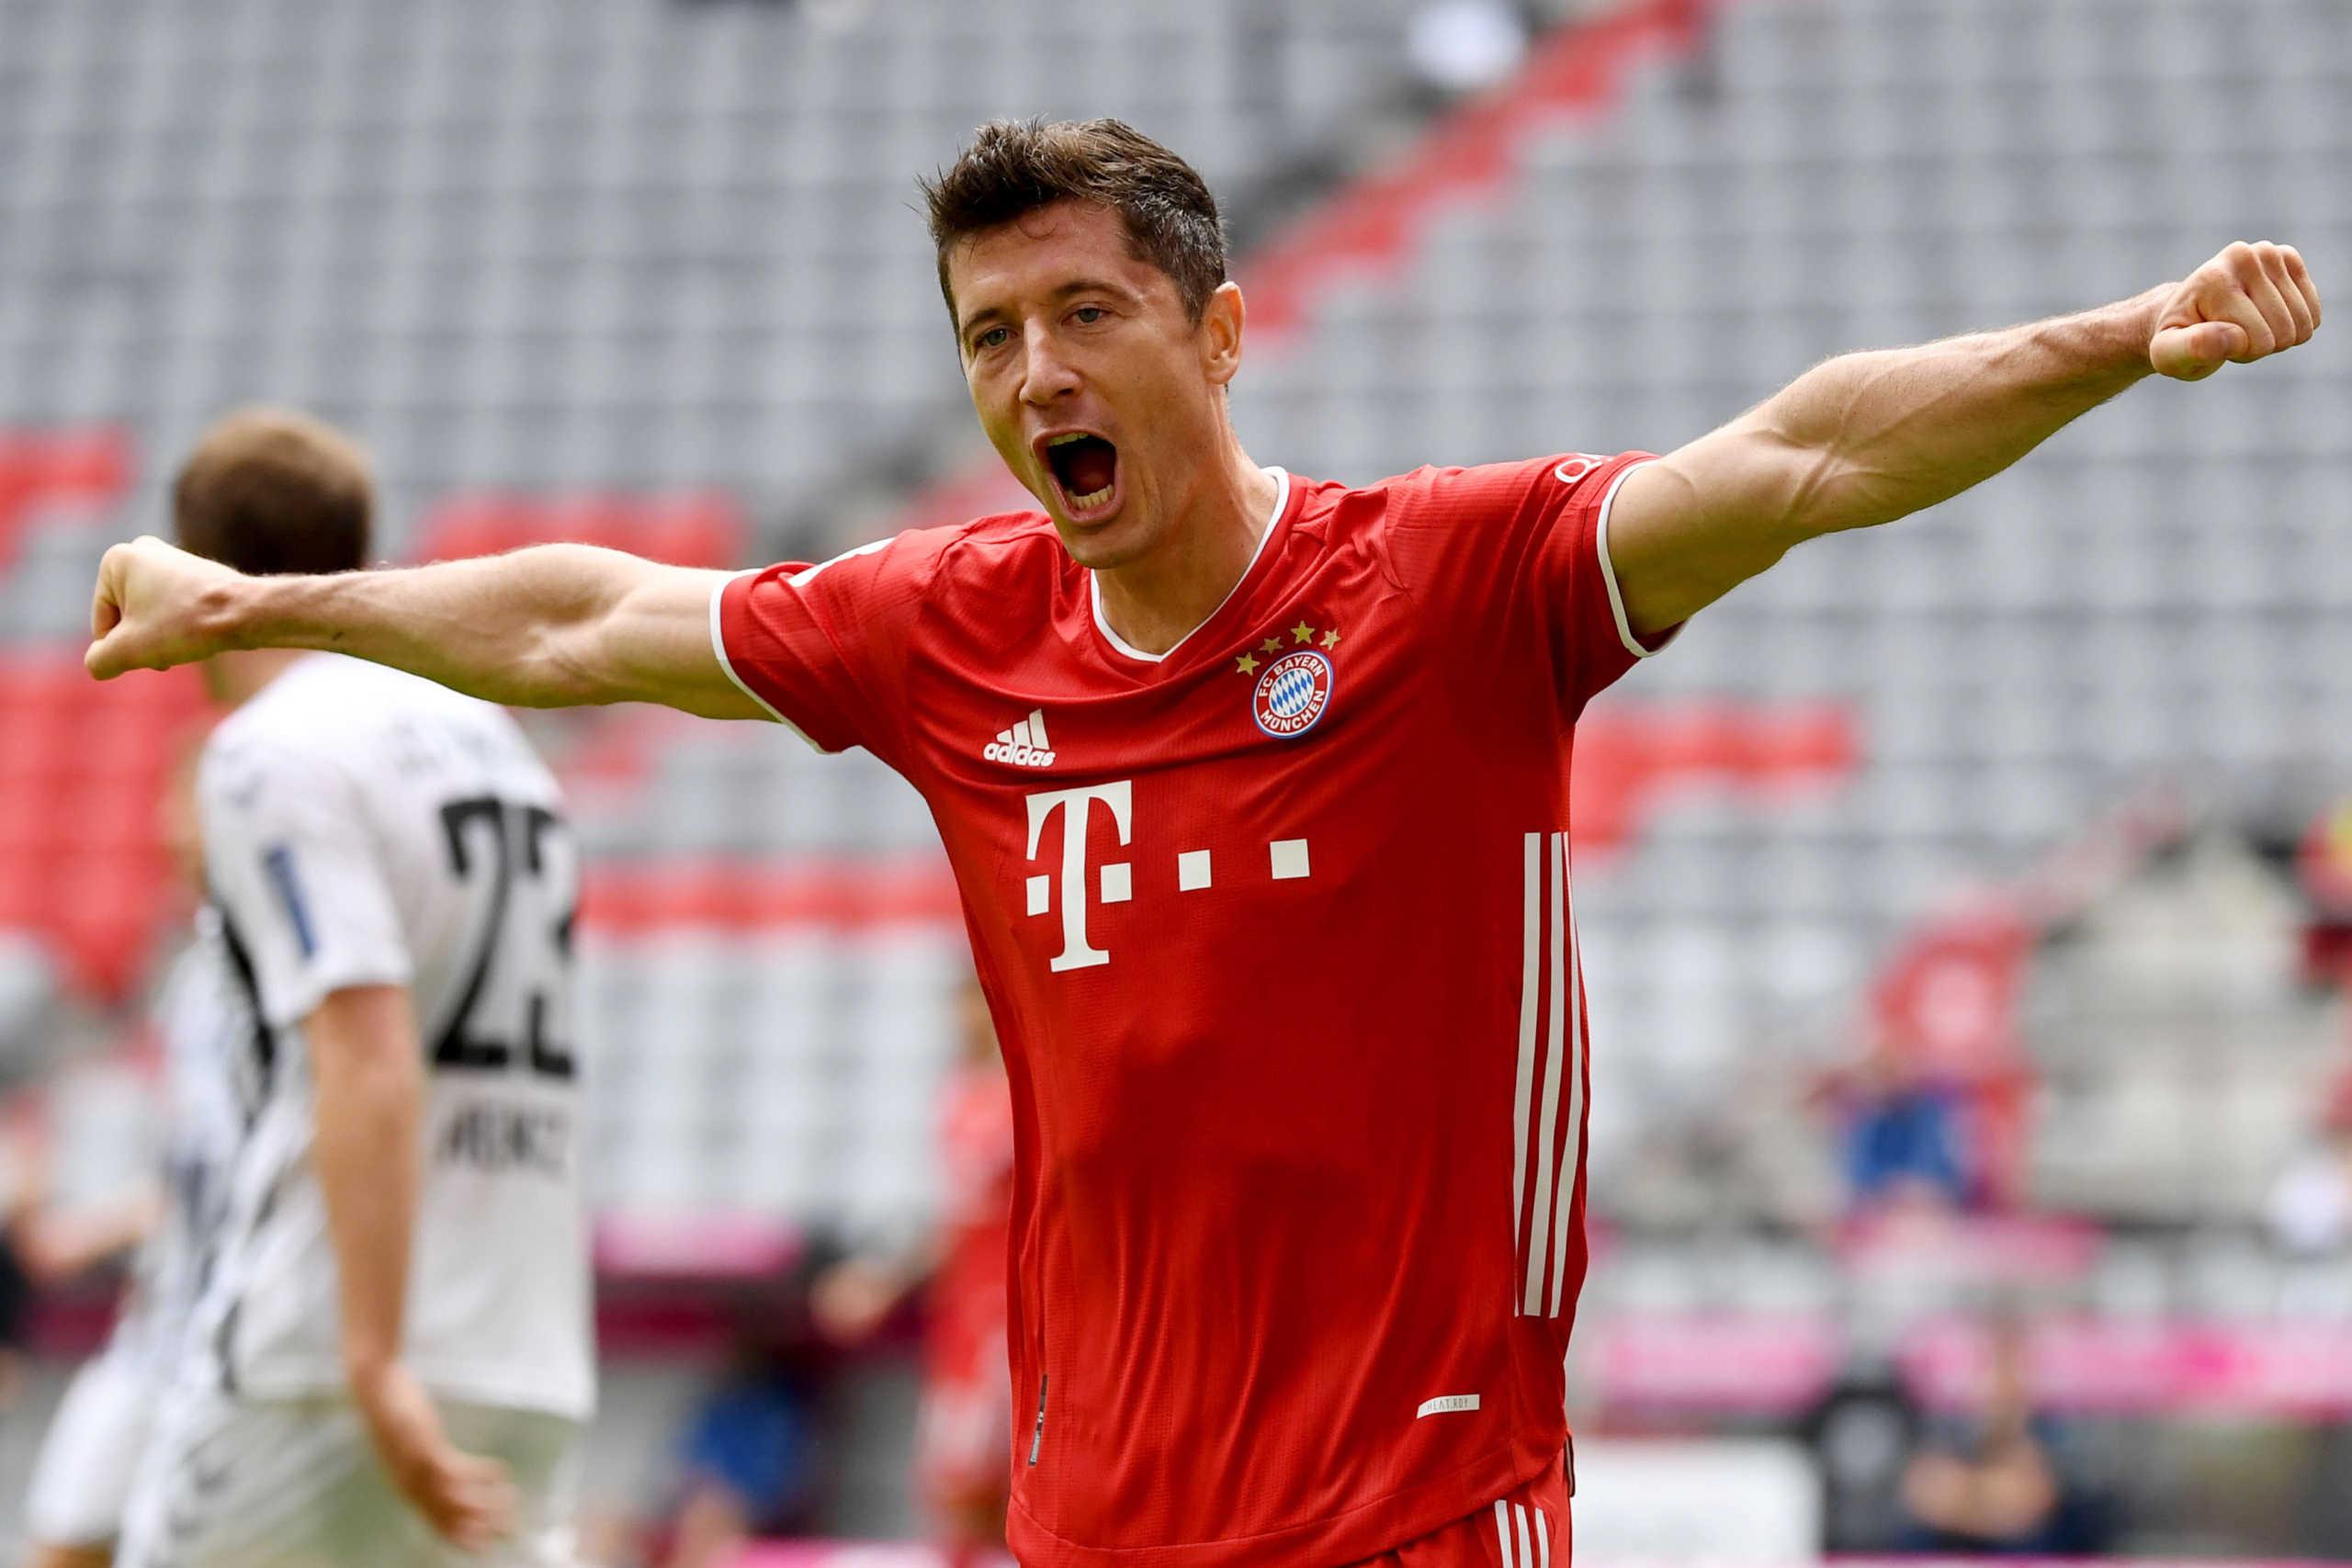 Bundesliga: Παίκτης της χρονιάς ο Λεβαντόφσκι (video)